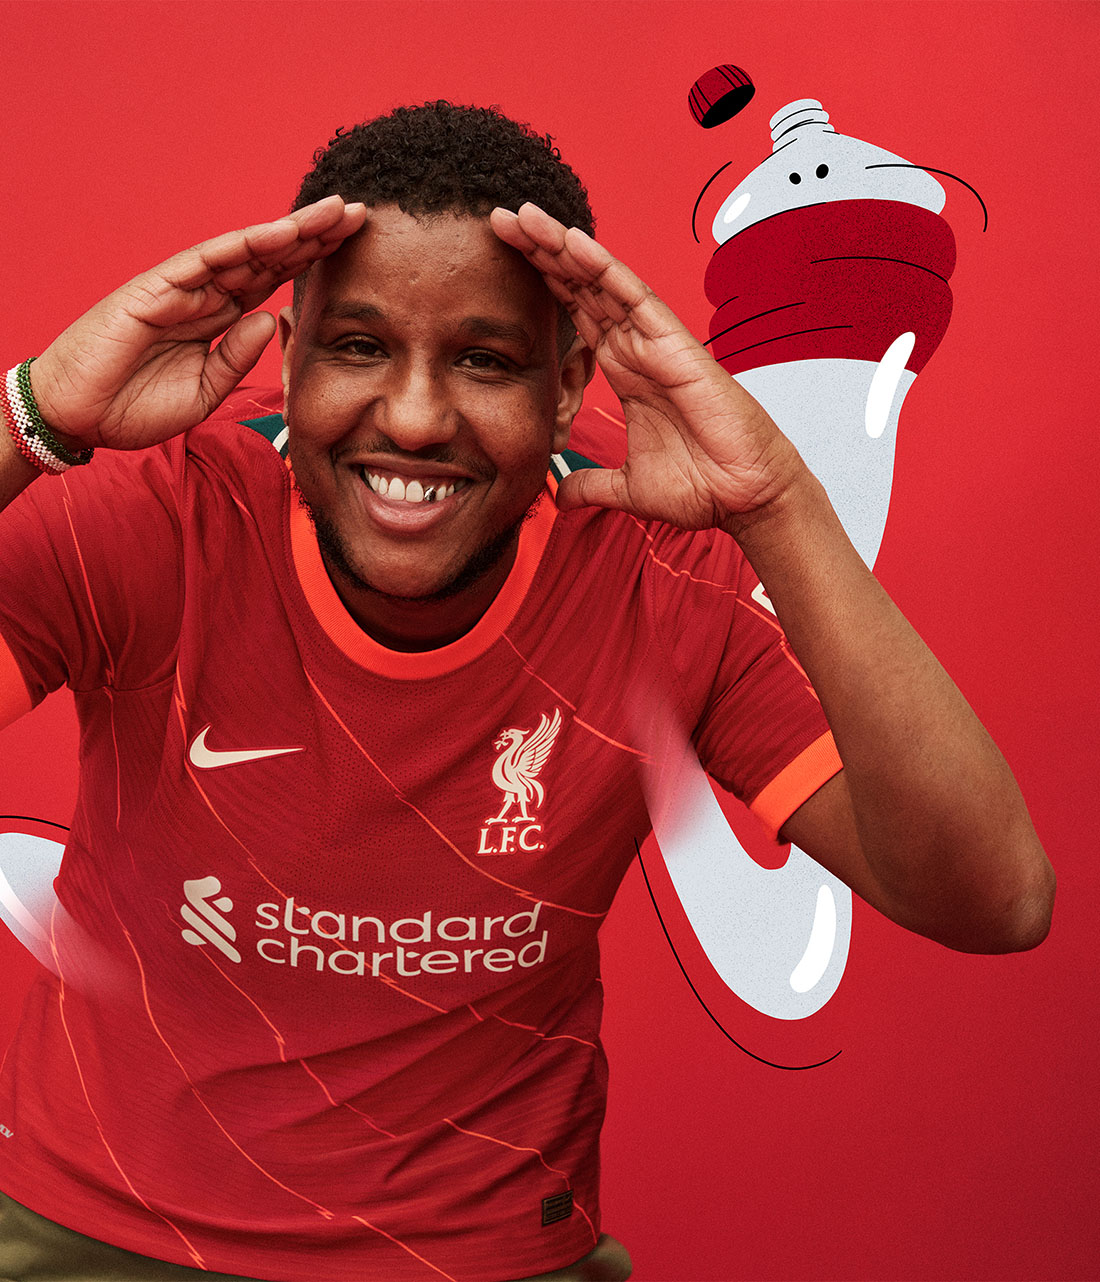 Nike Football x Liverpool Maillot 2021-2022